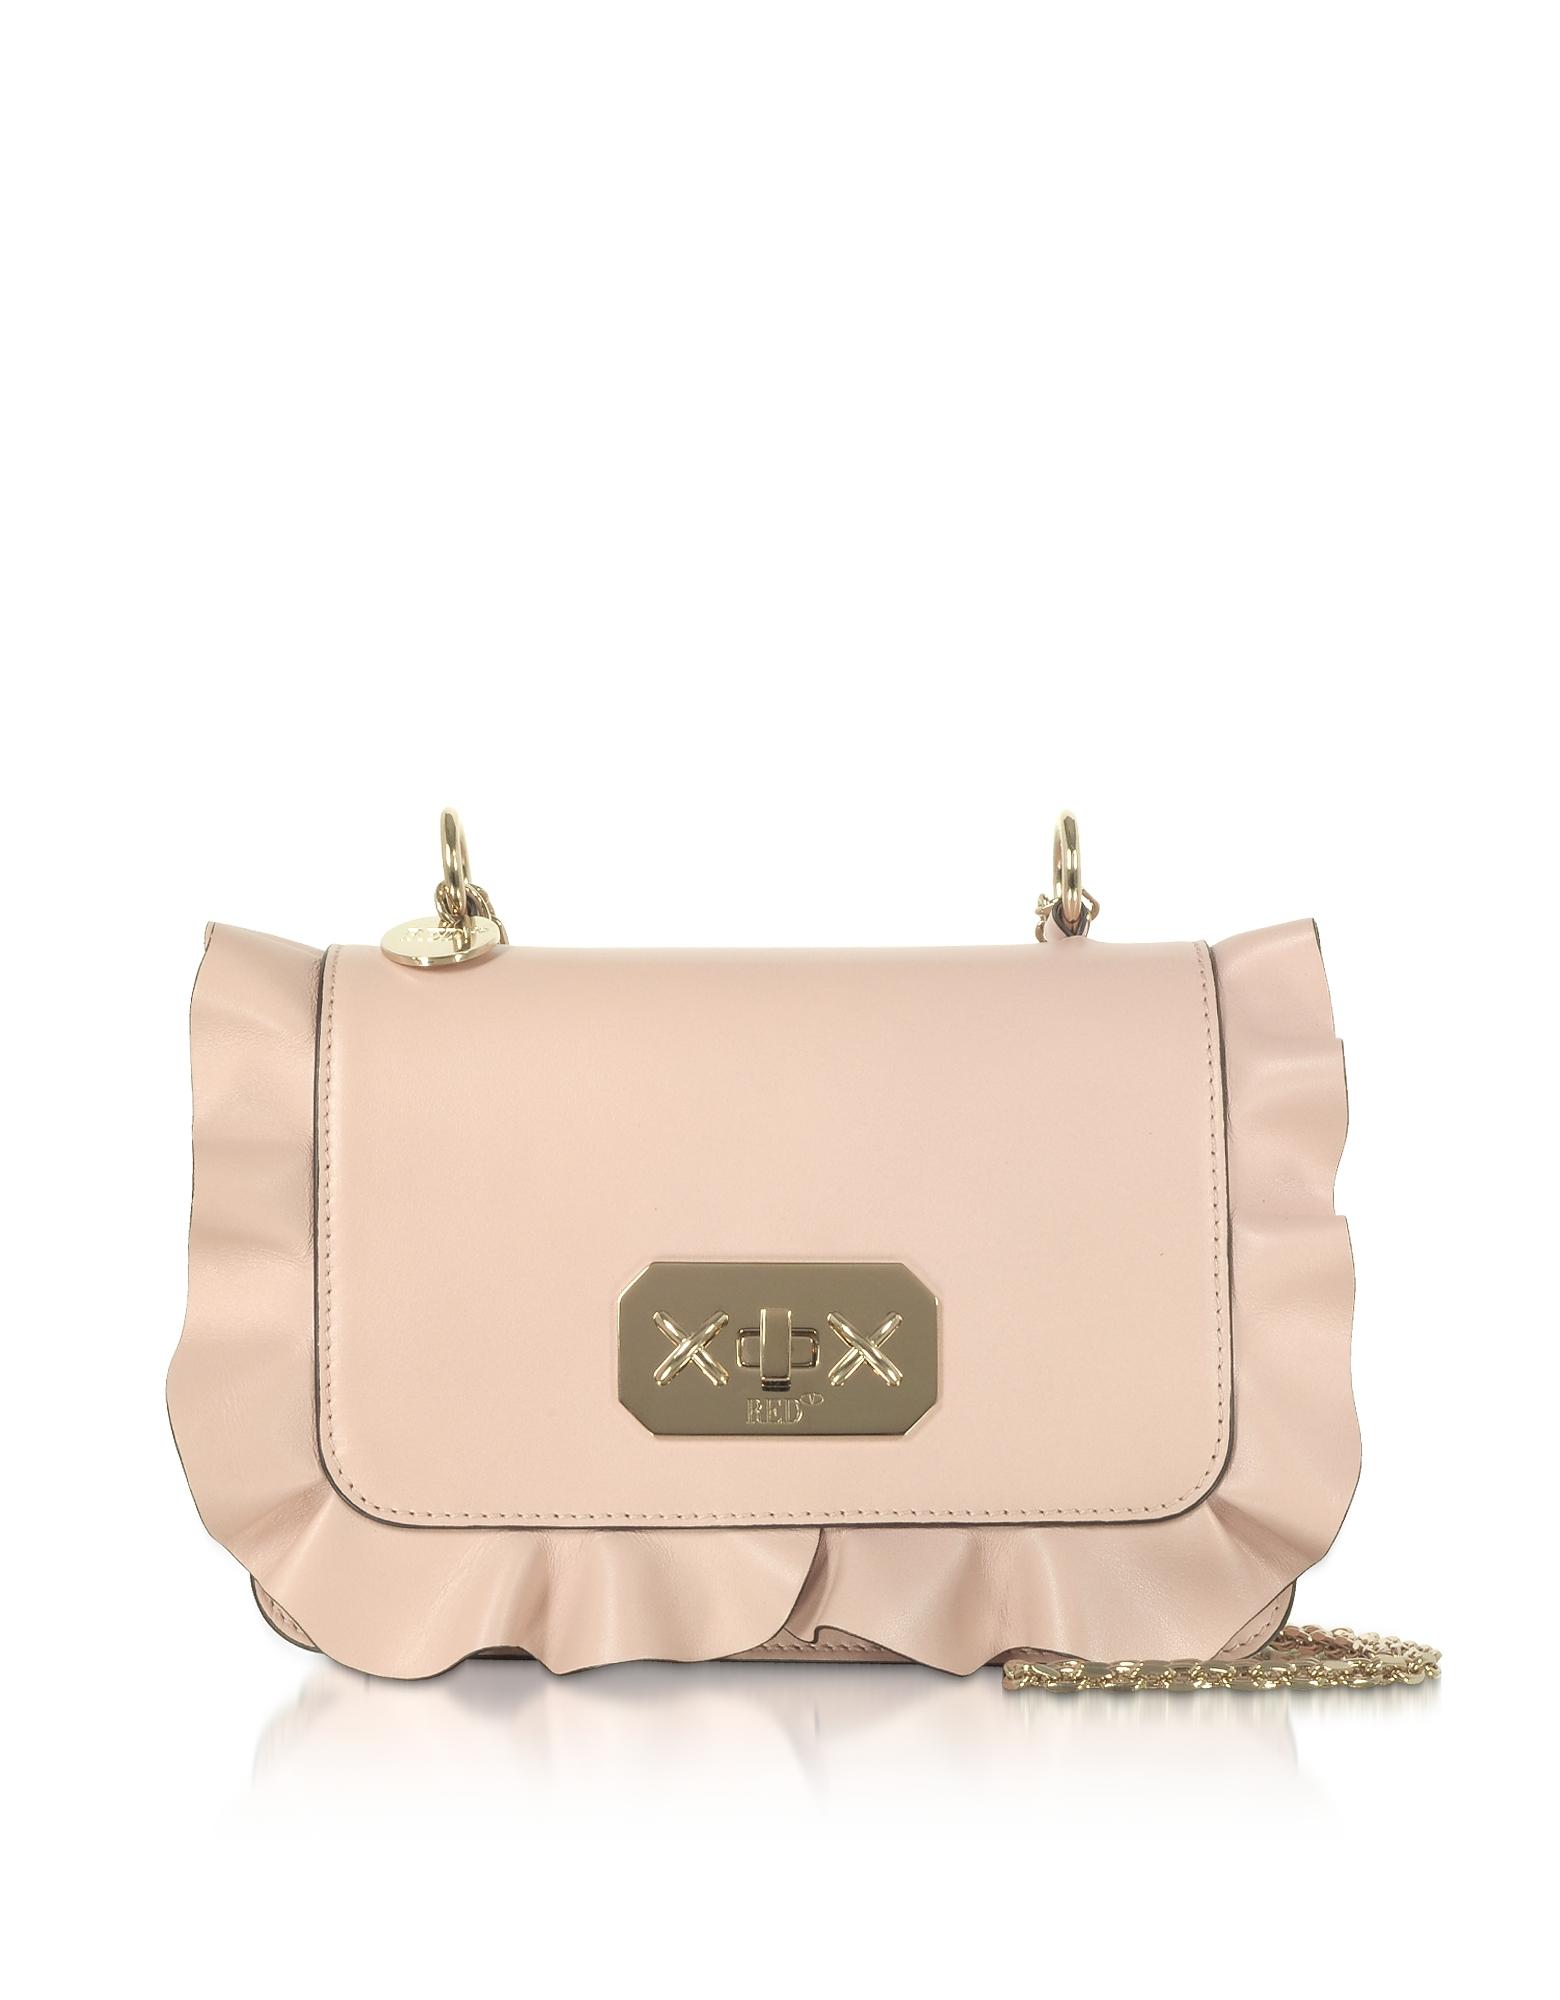 Rock Ruffles Shoulder Bag w/ Gold Chain Strap, Nude